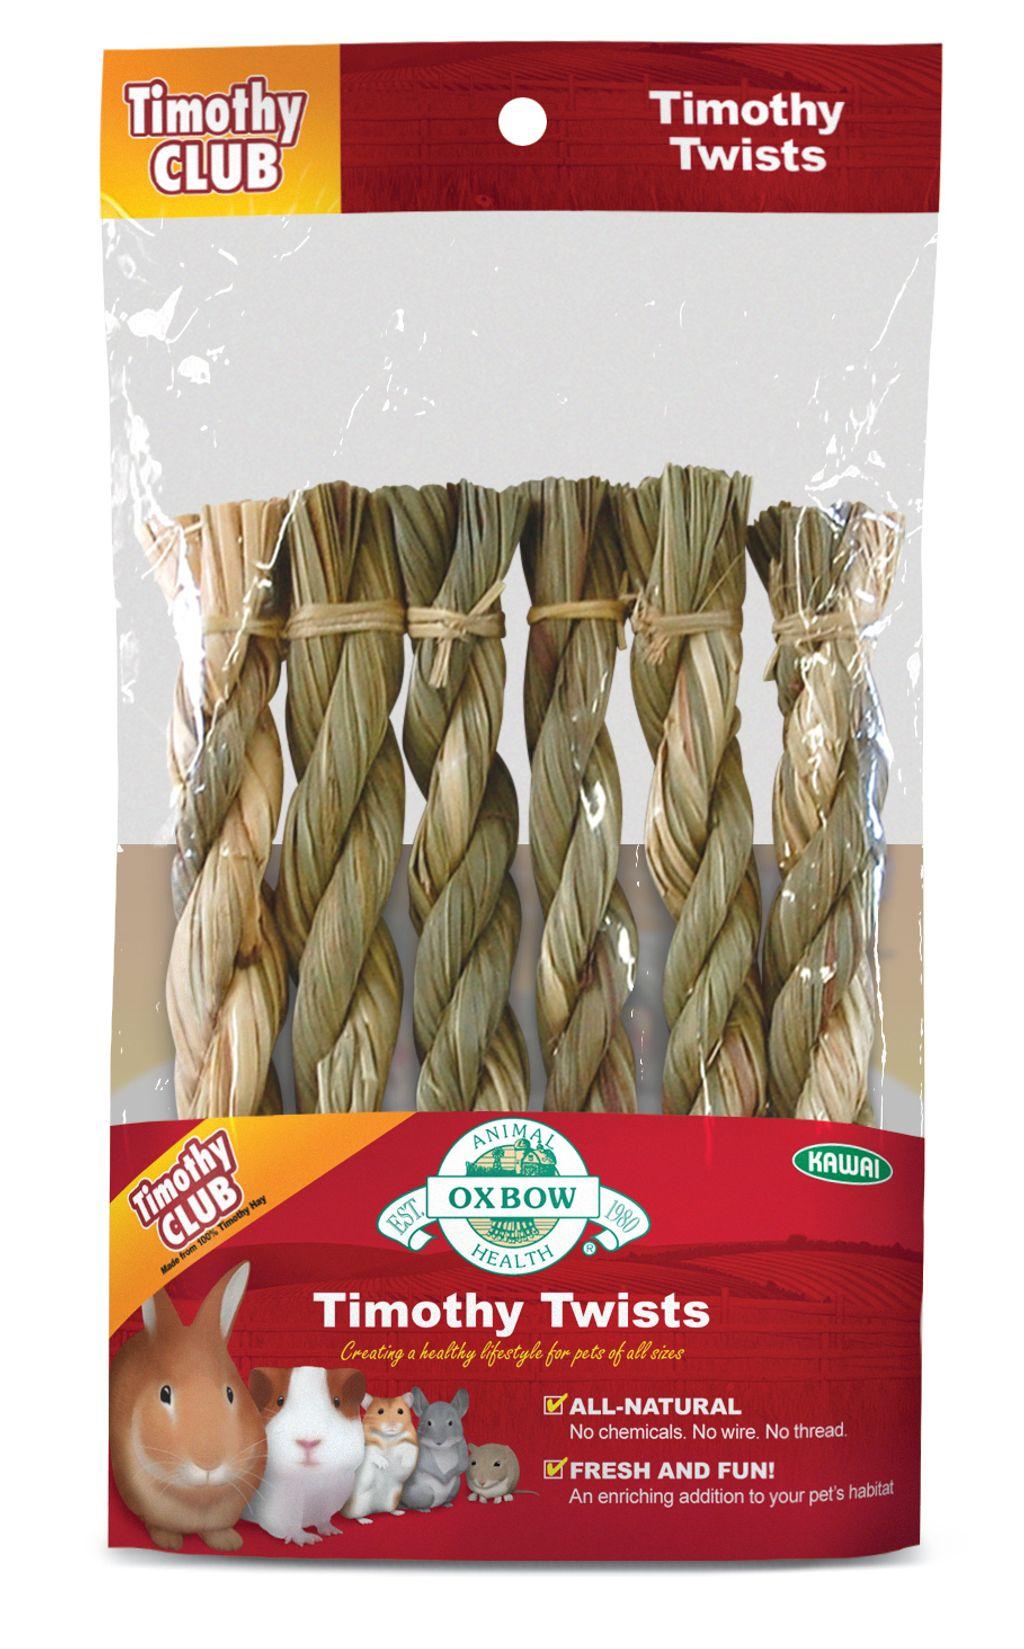 O56 Timothy Twists.jpg